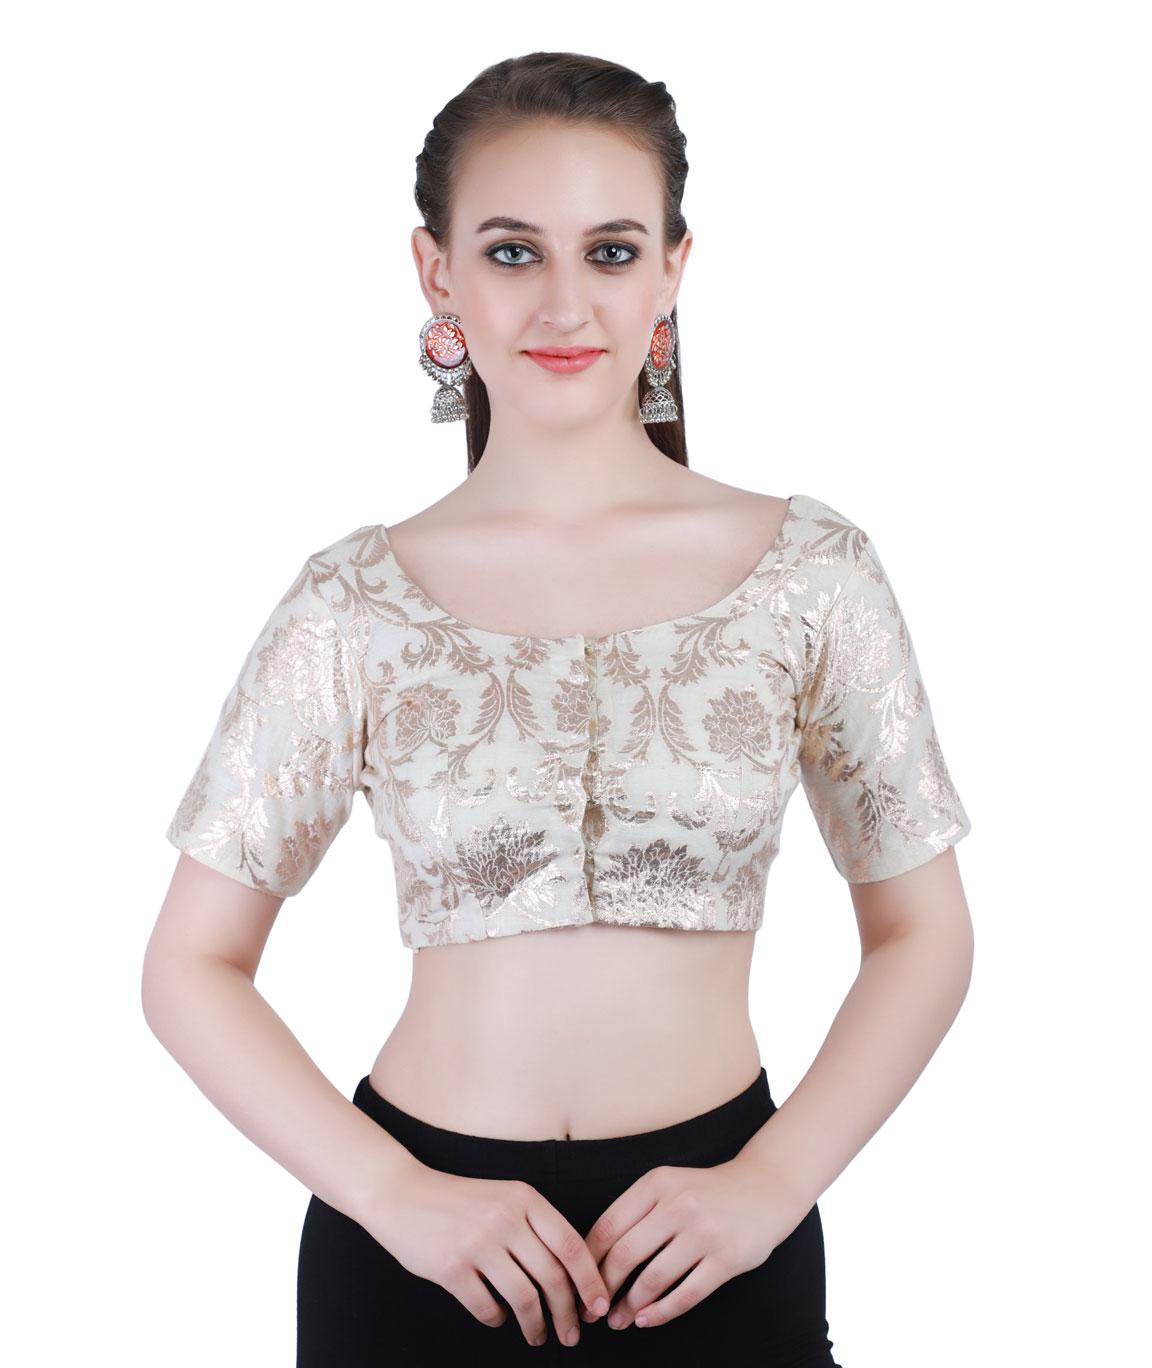 Banarasi Handloom Chanderi Silk Jacquard Round Neck Blouse In white With Hook Closure on Front